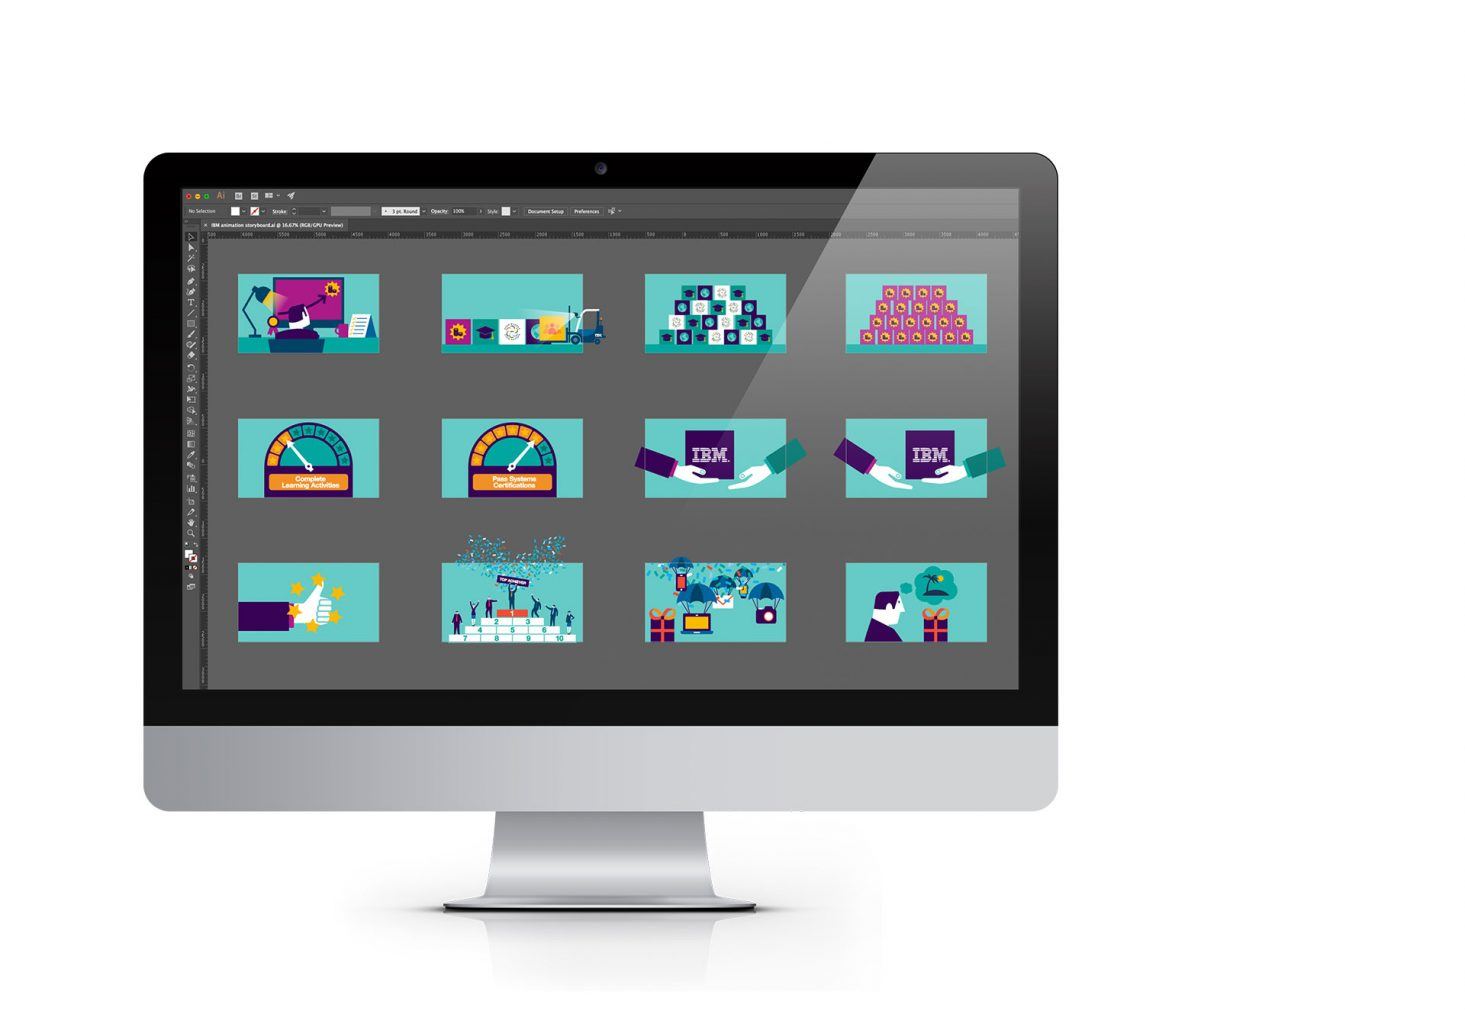 KYI IBM Animation storyboard